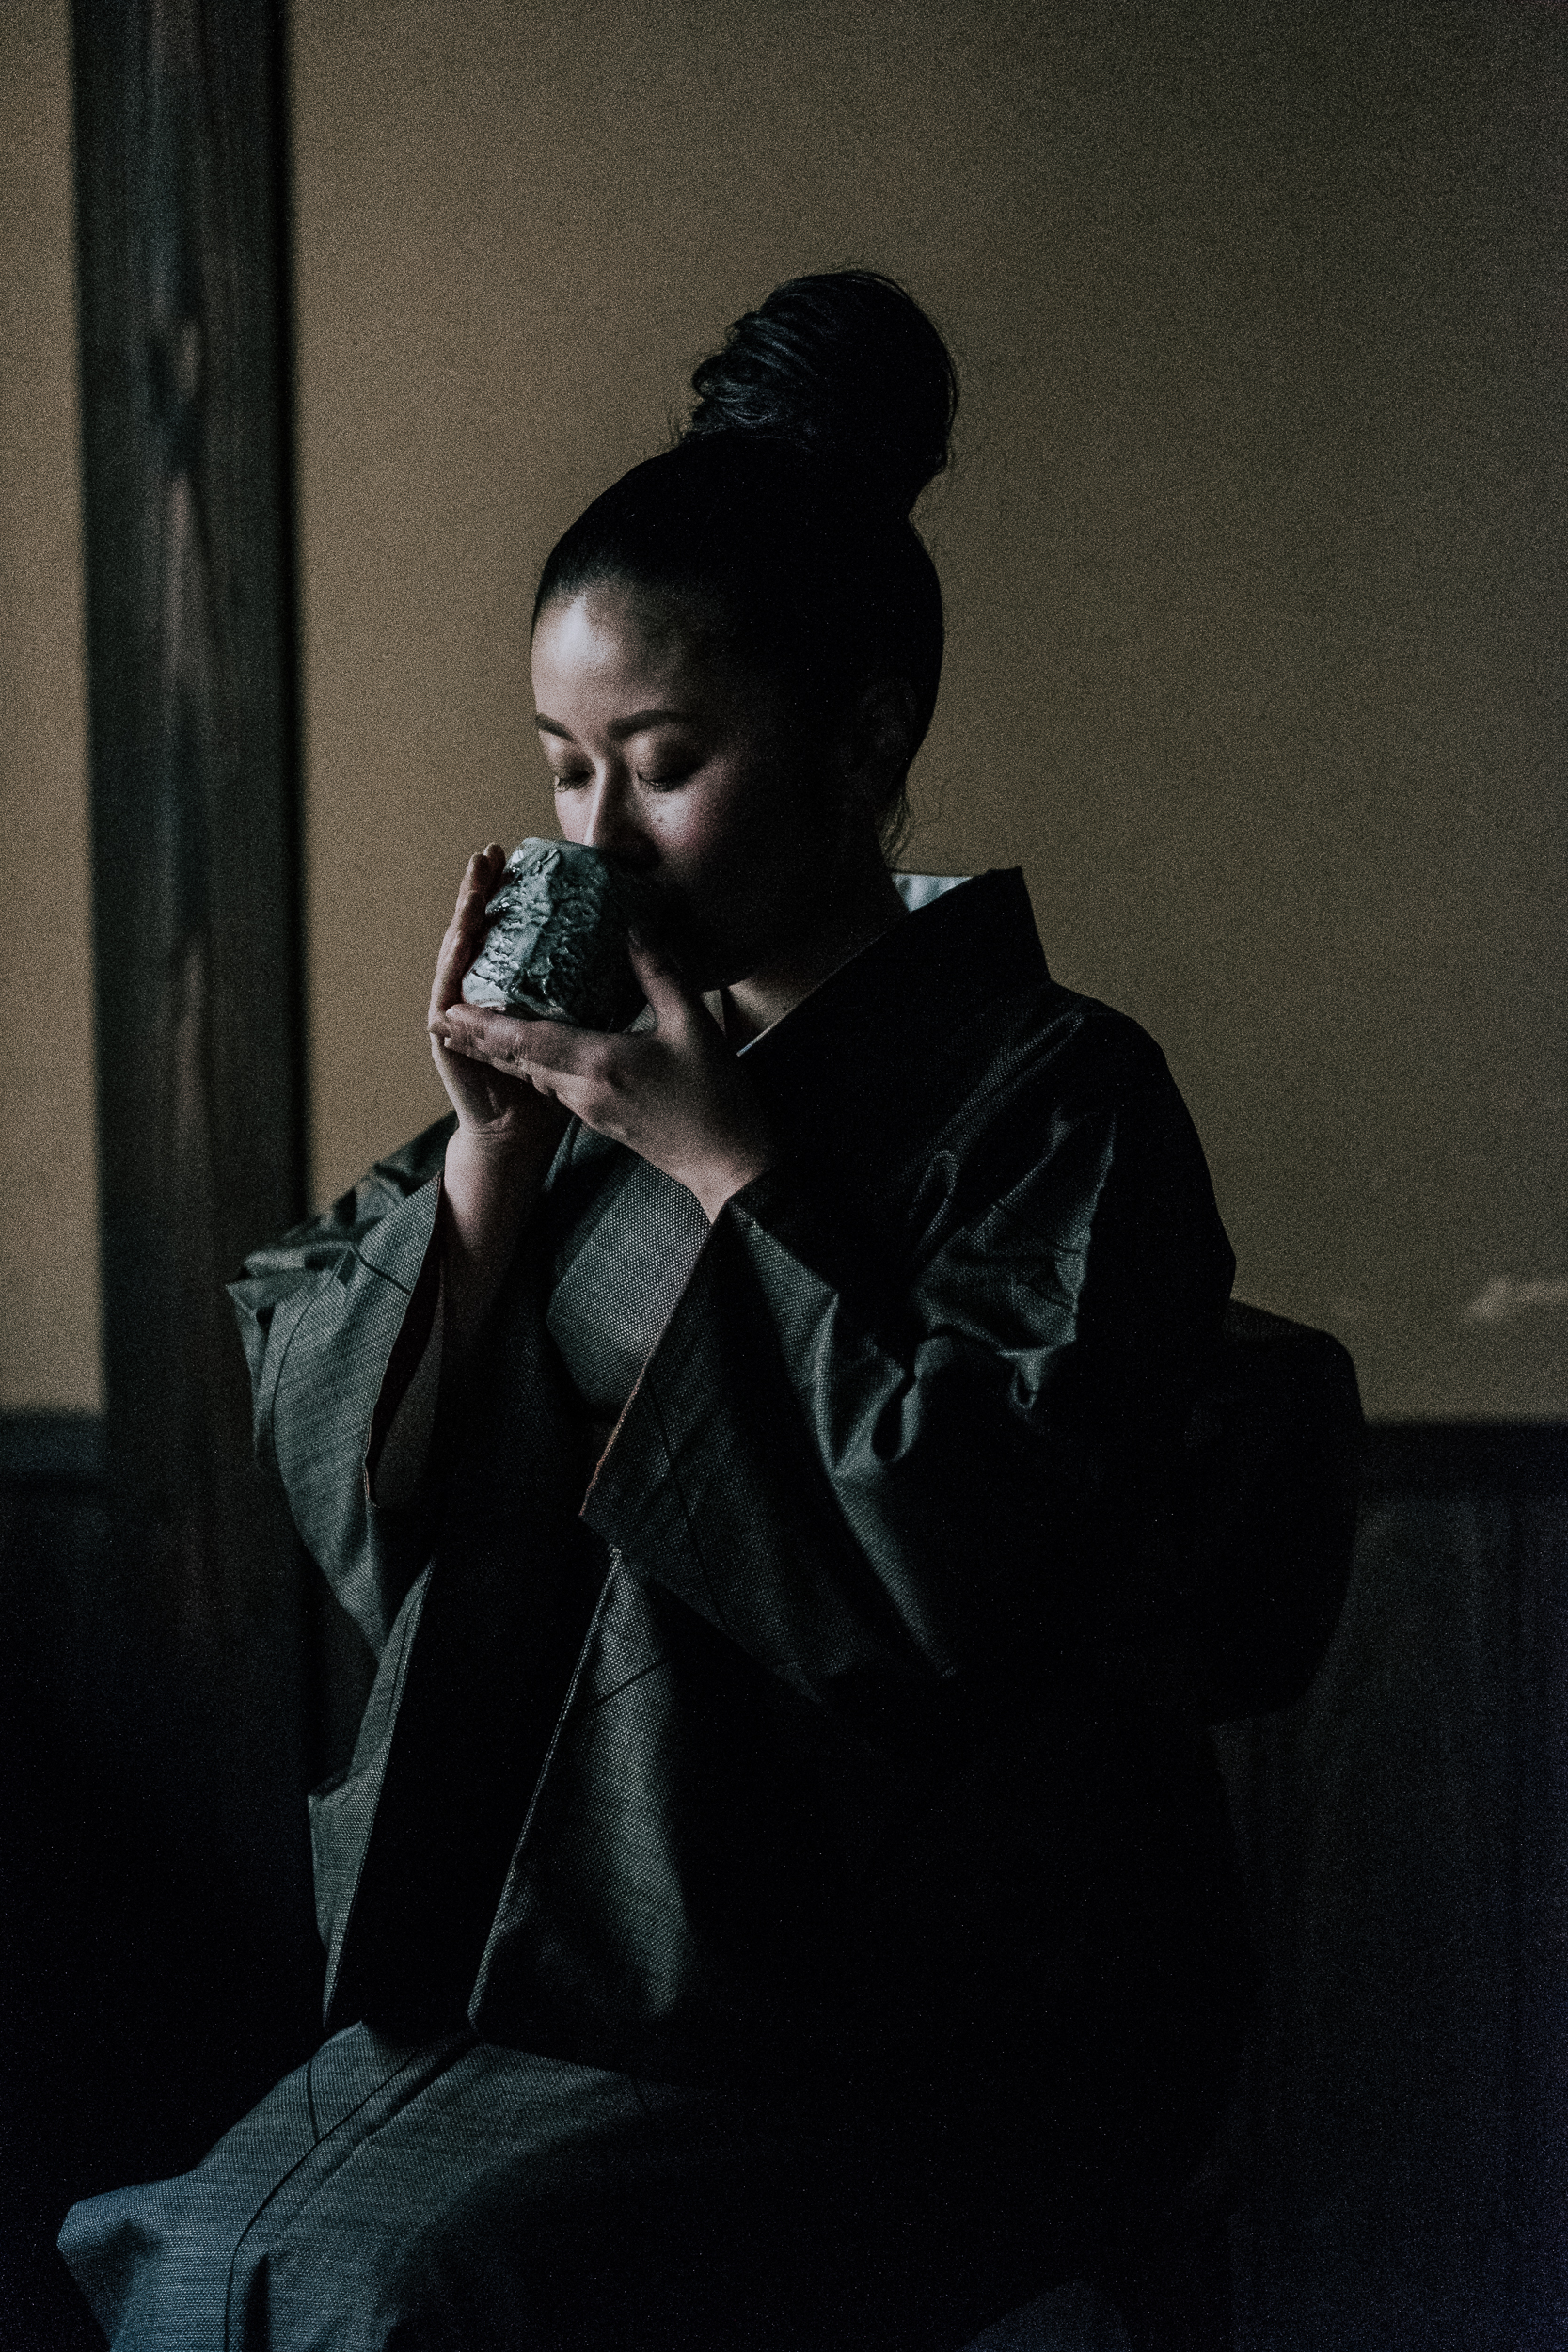 The young matriarch of Ryokan Sanga, Mayu Goto,posing beautifully.